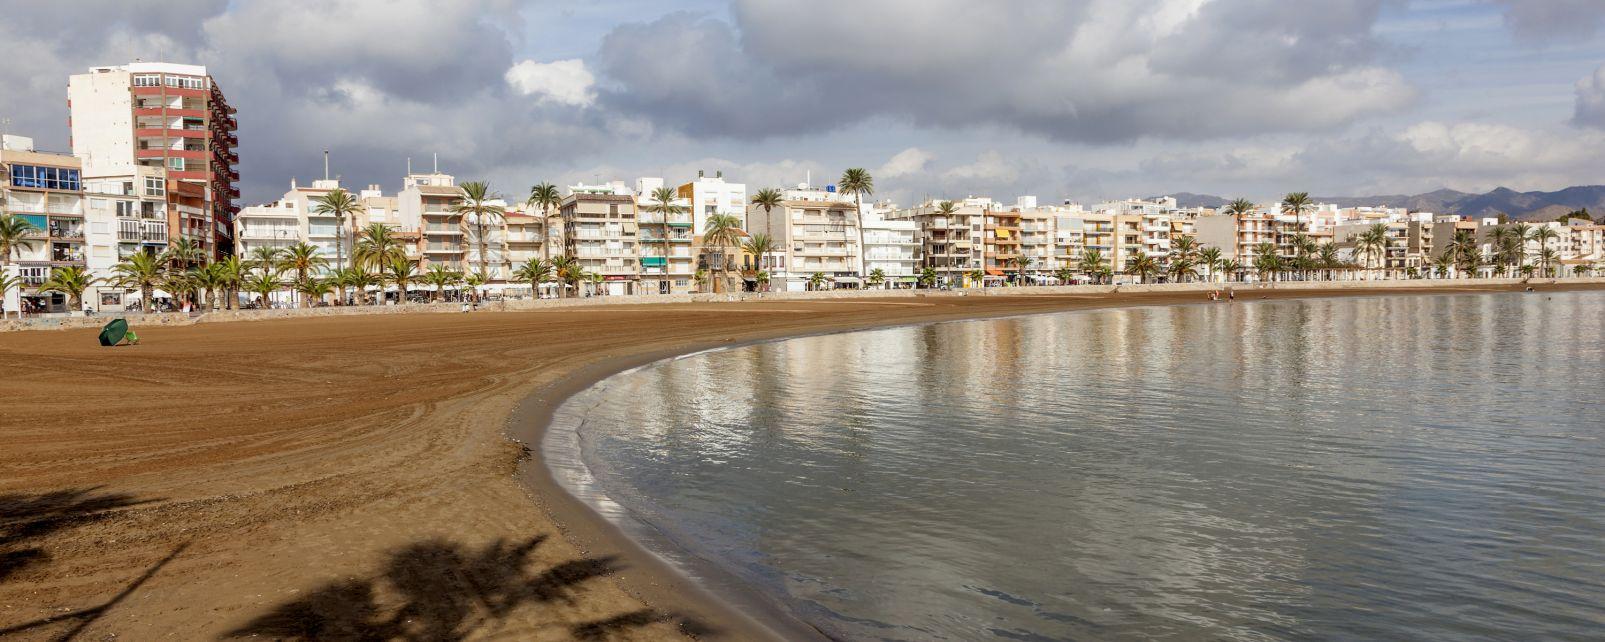 Puerto De Mazarron, Murcie, Espagne